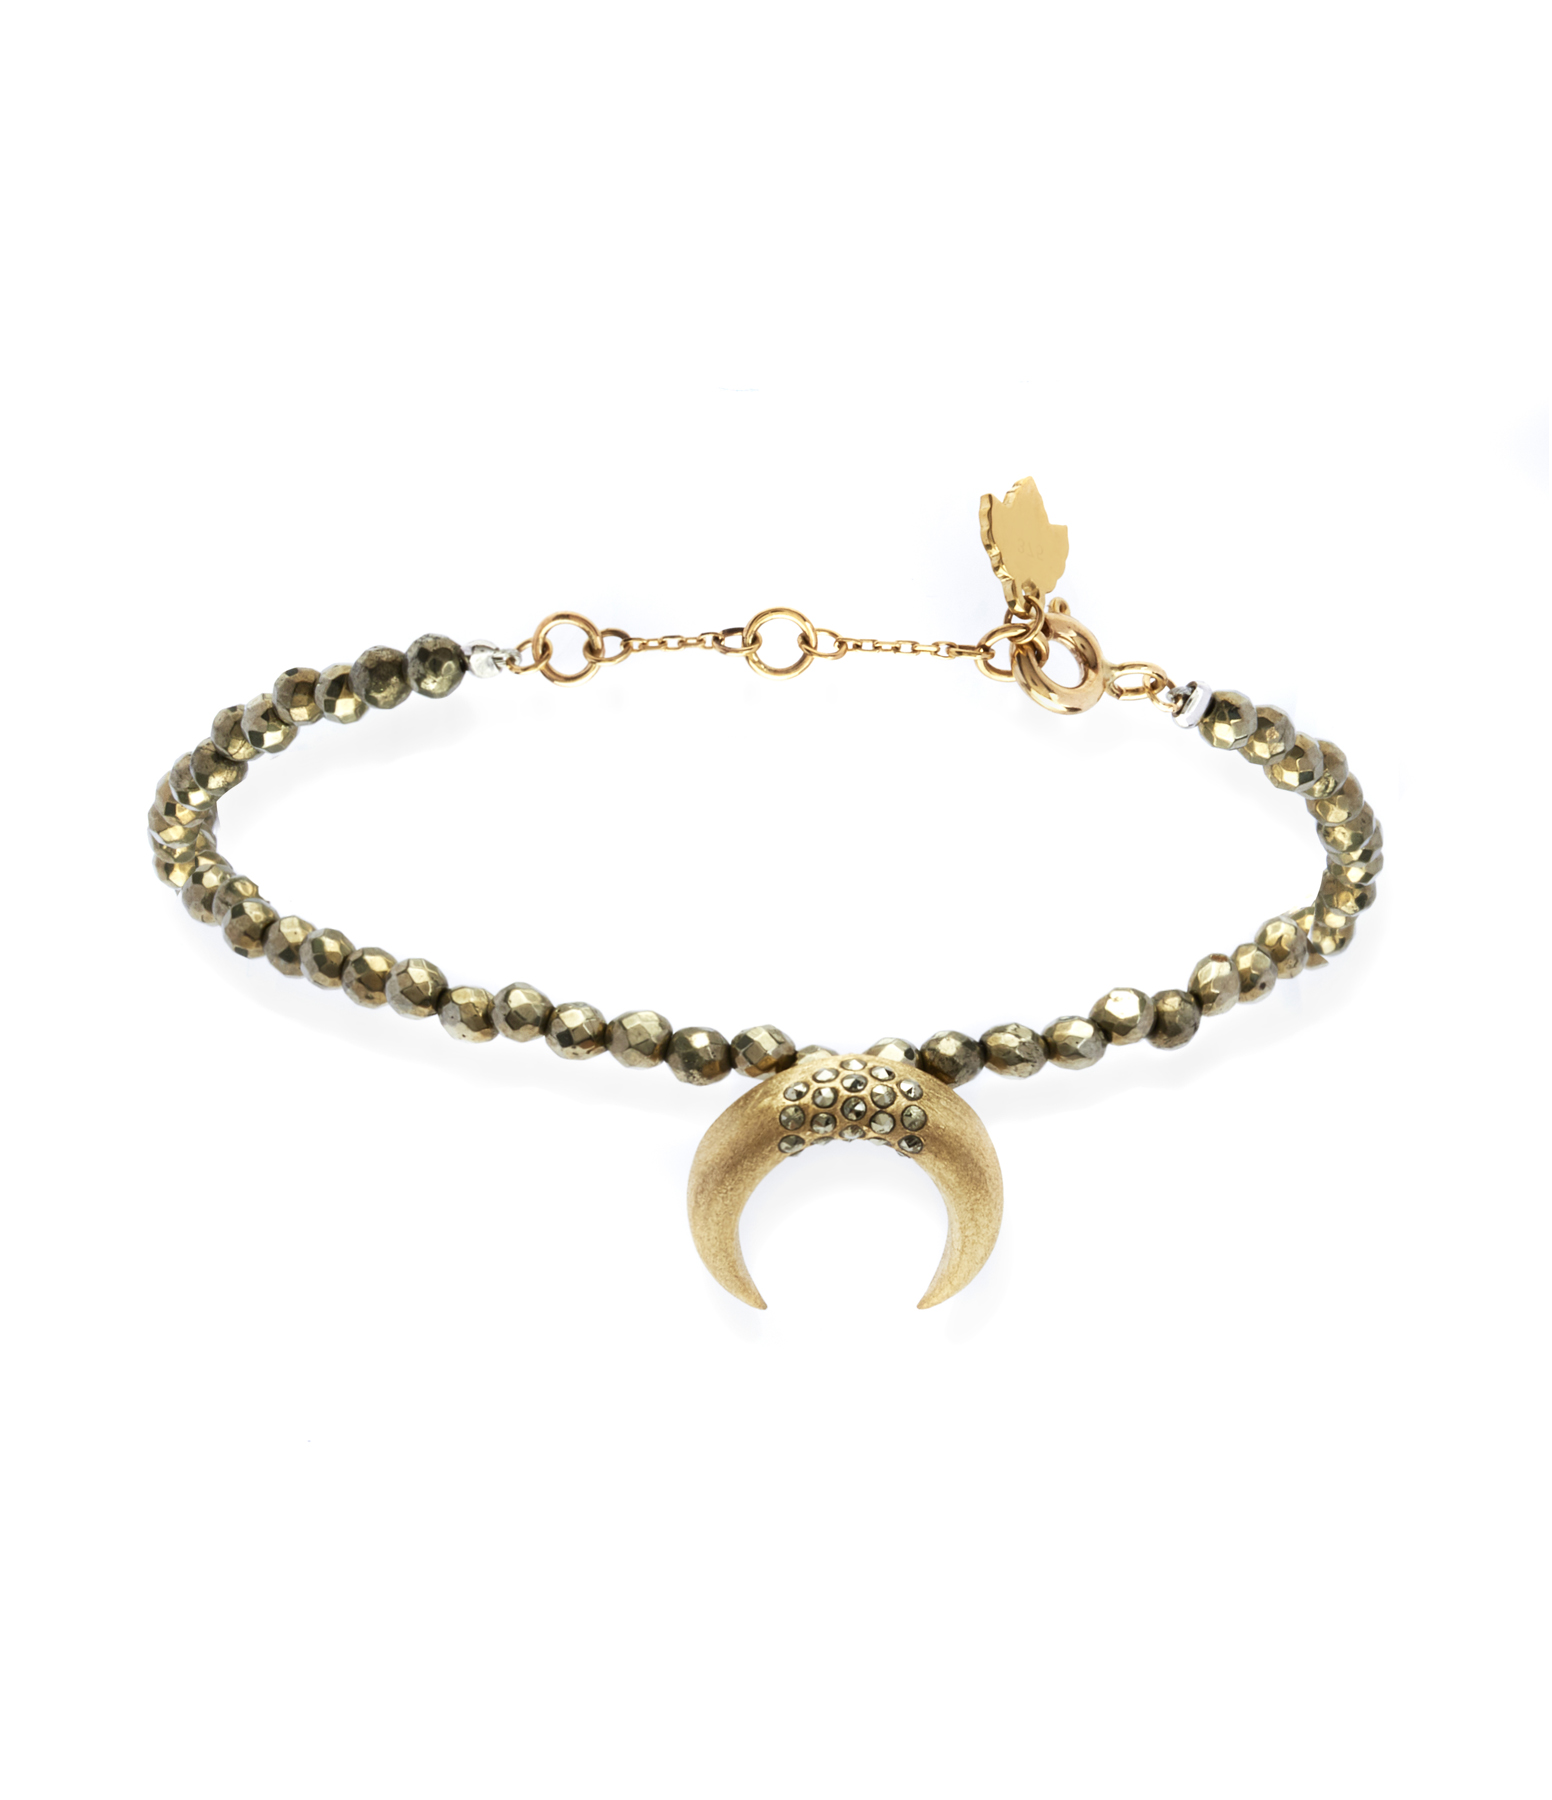 Bracelet Corne Lune Pyrite Antik Or Jaune 9K